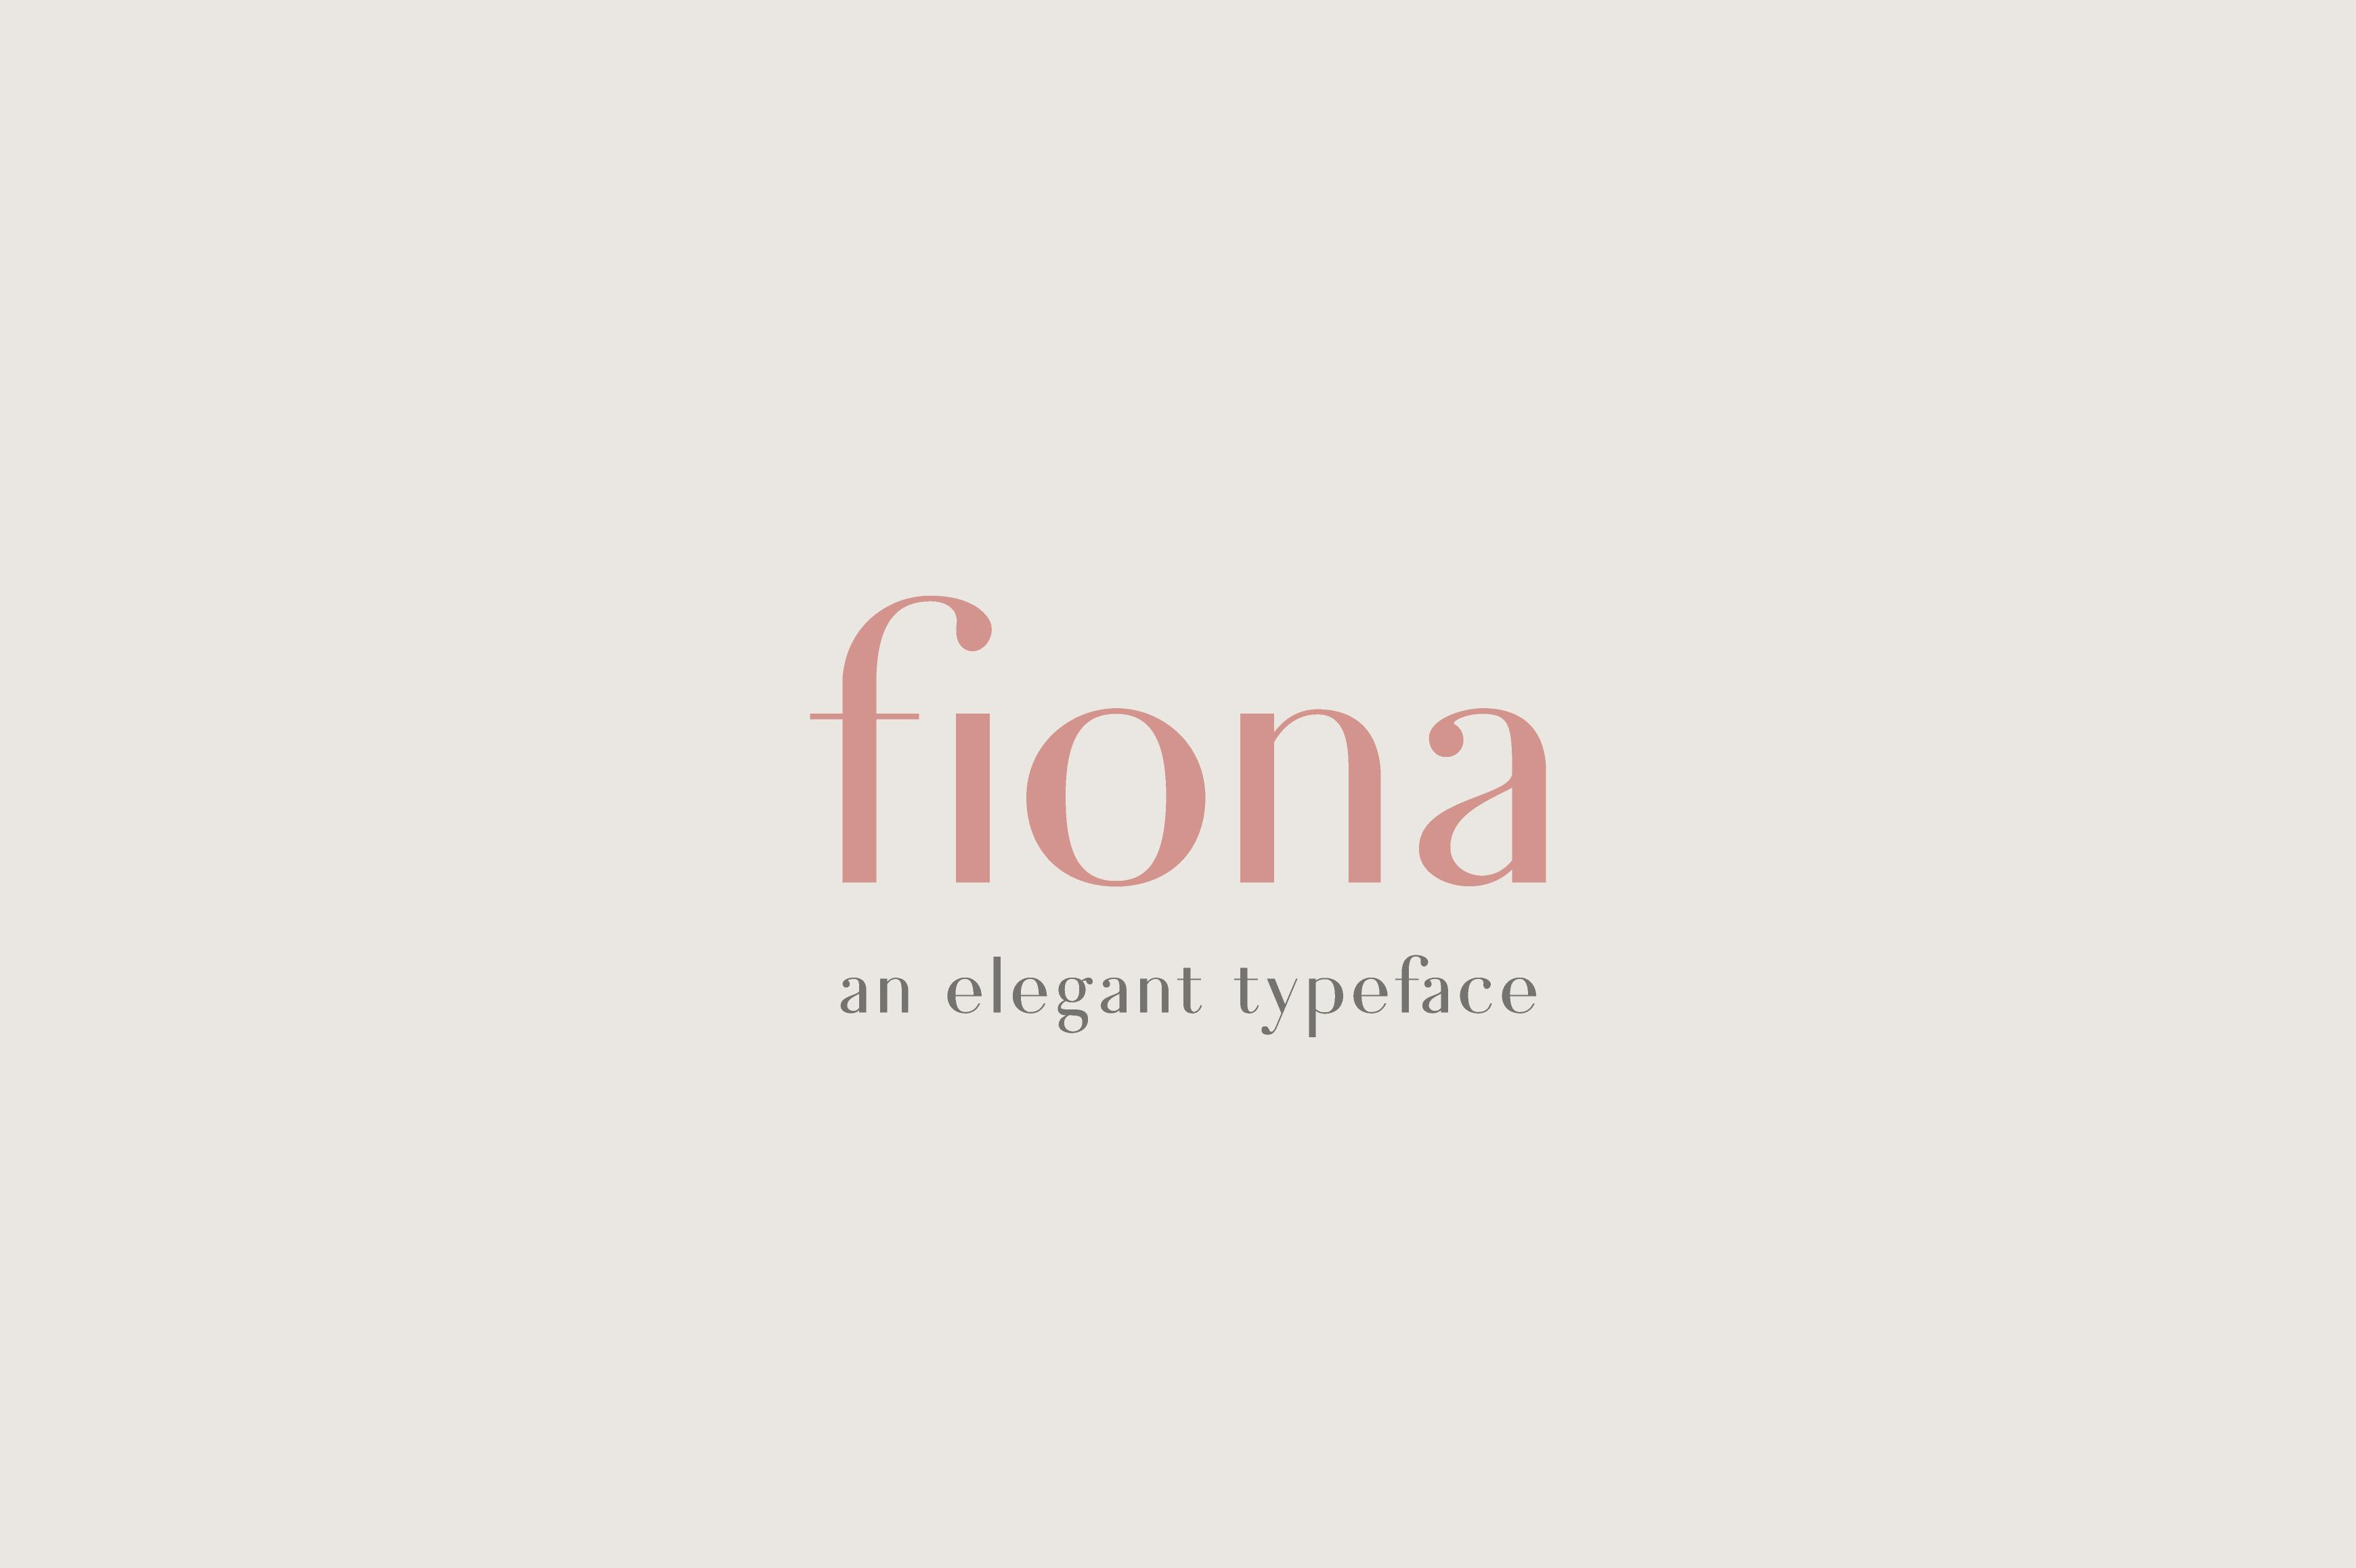 Fiona - An Elegant Typeface example image 1